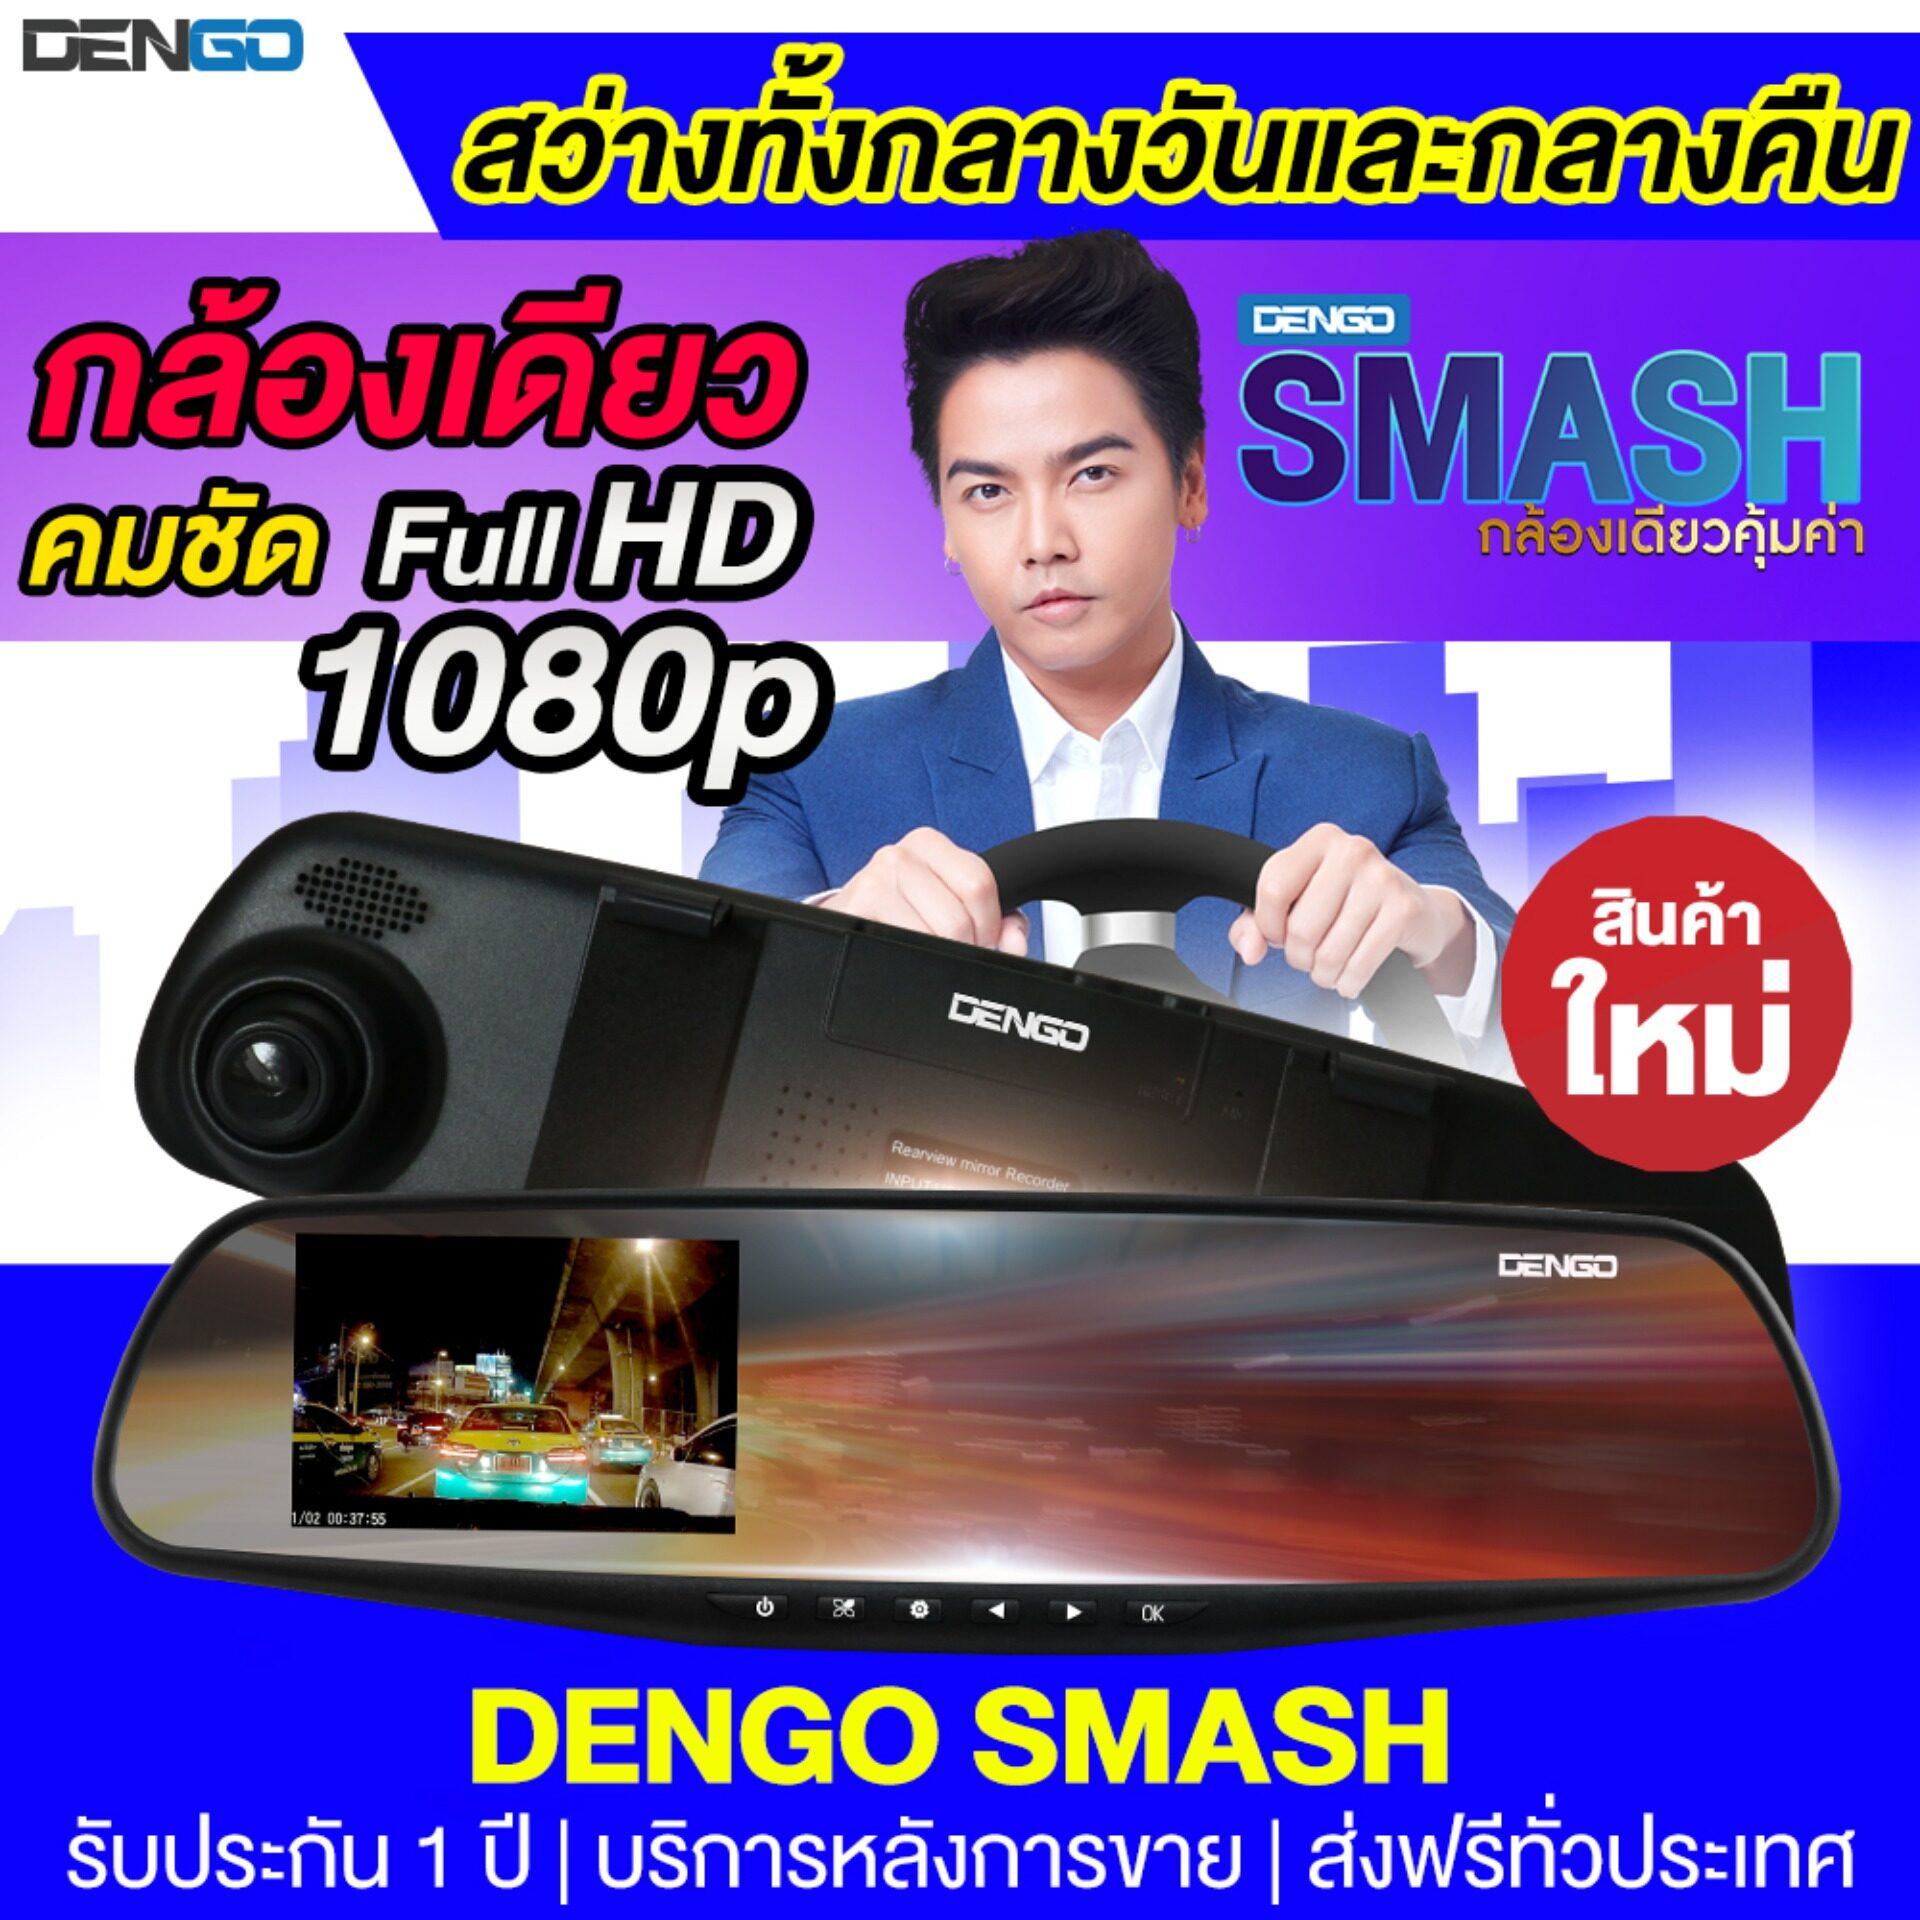 Dengo Smash สุดยอดกล้องติดรถยนต์ สว่างทั้งกลางวันและกลางคืนชัดระดับfhd กล้องเดียวเอาอยู่ ทุกสภาพแสง จอด้านซ้ายเลนส์ขวา ออกแบบมาเพื่อคนไทย +wdr ปรับแสงได้แม้แสงน้อย + จอกว้าง 3.5 นิ้ว+parking Modeบันทึกขณะจอด+motion Detectตรวจจับการเคลื่อนไหว.